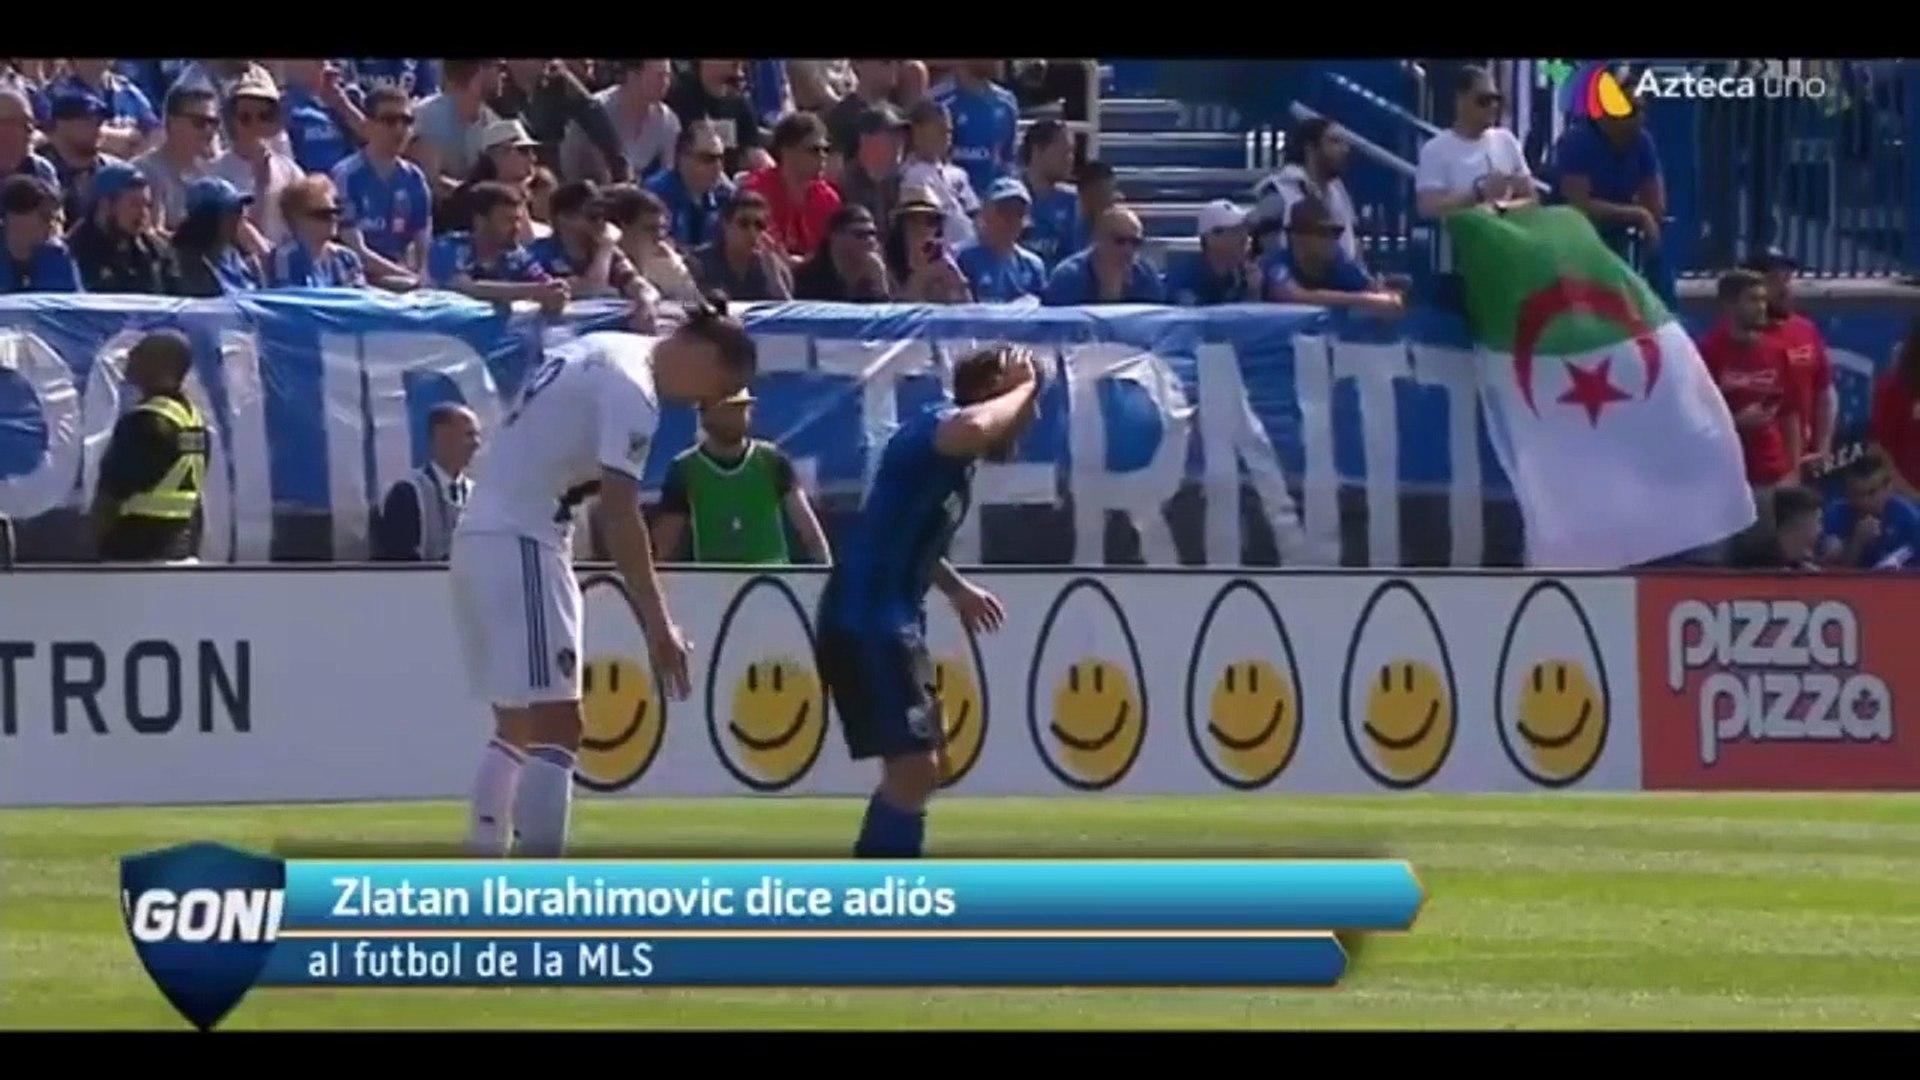 Zlatan Ibrahimovic dice adiós a la MLS | Azteca Deportes